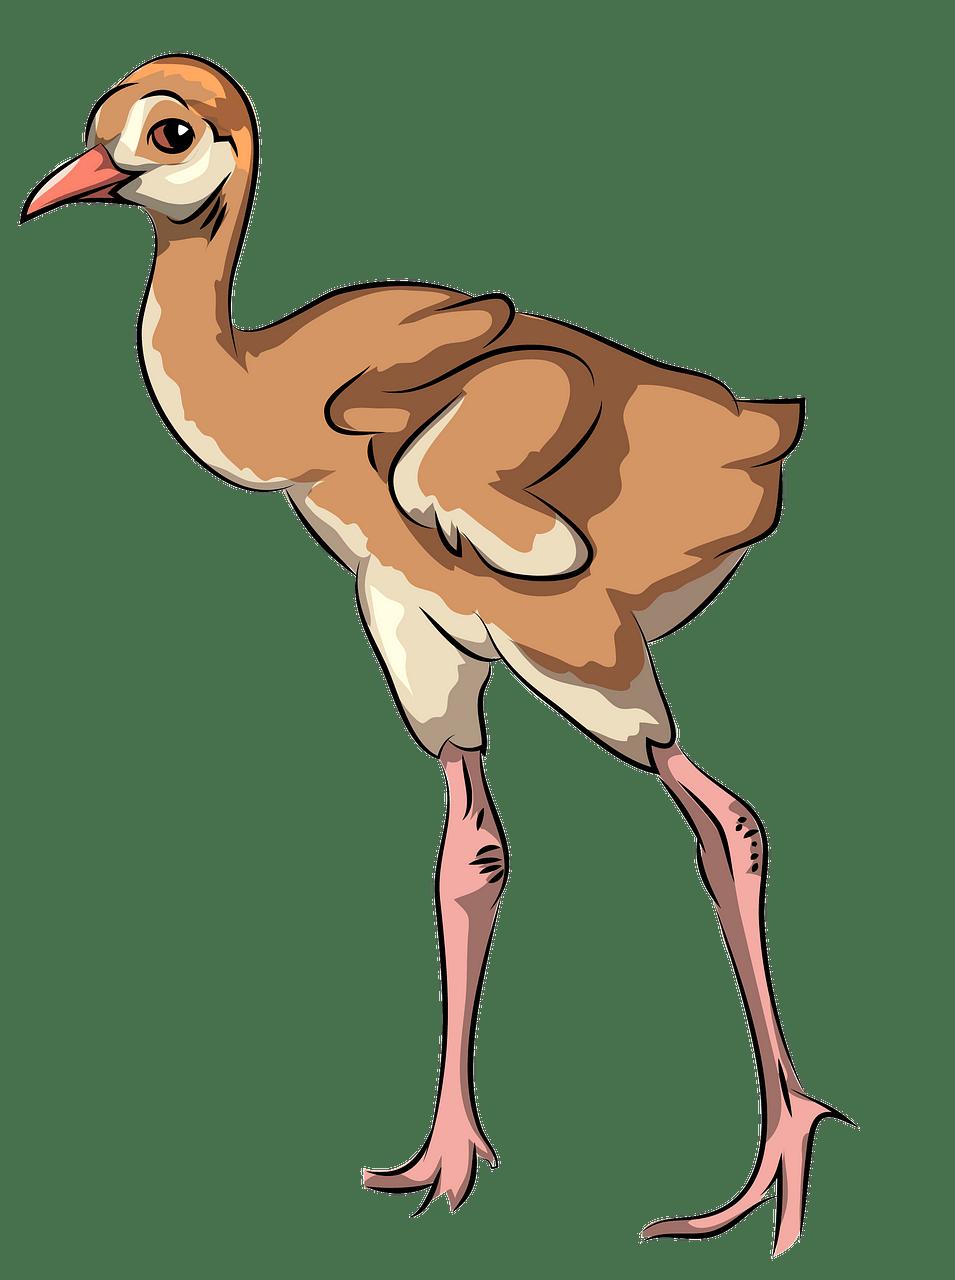 Sandhill crane chick clipart. Free download..